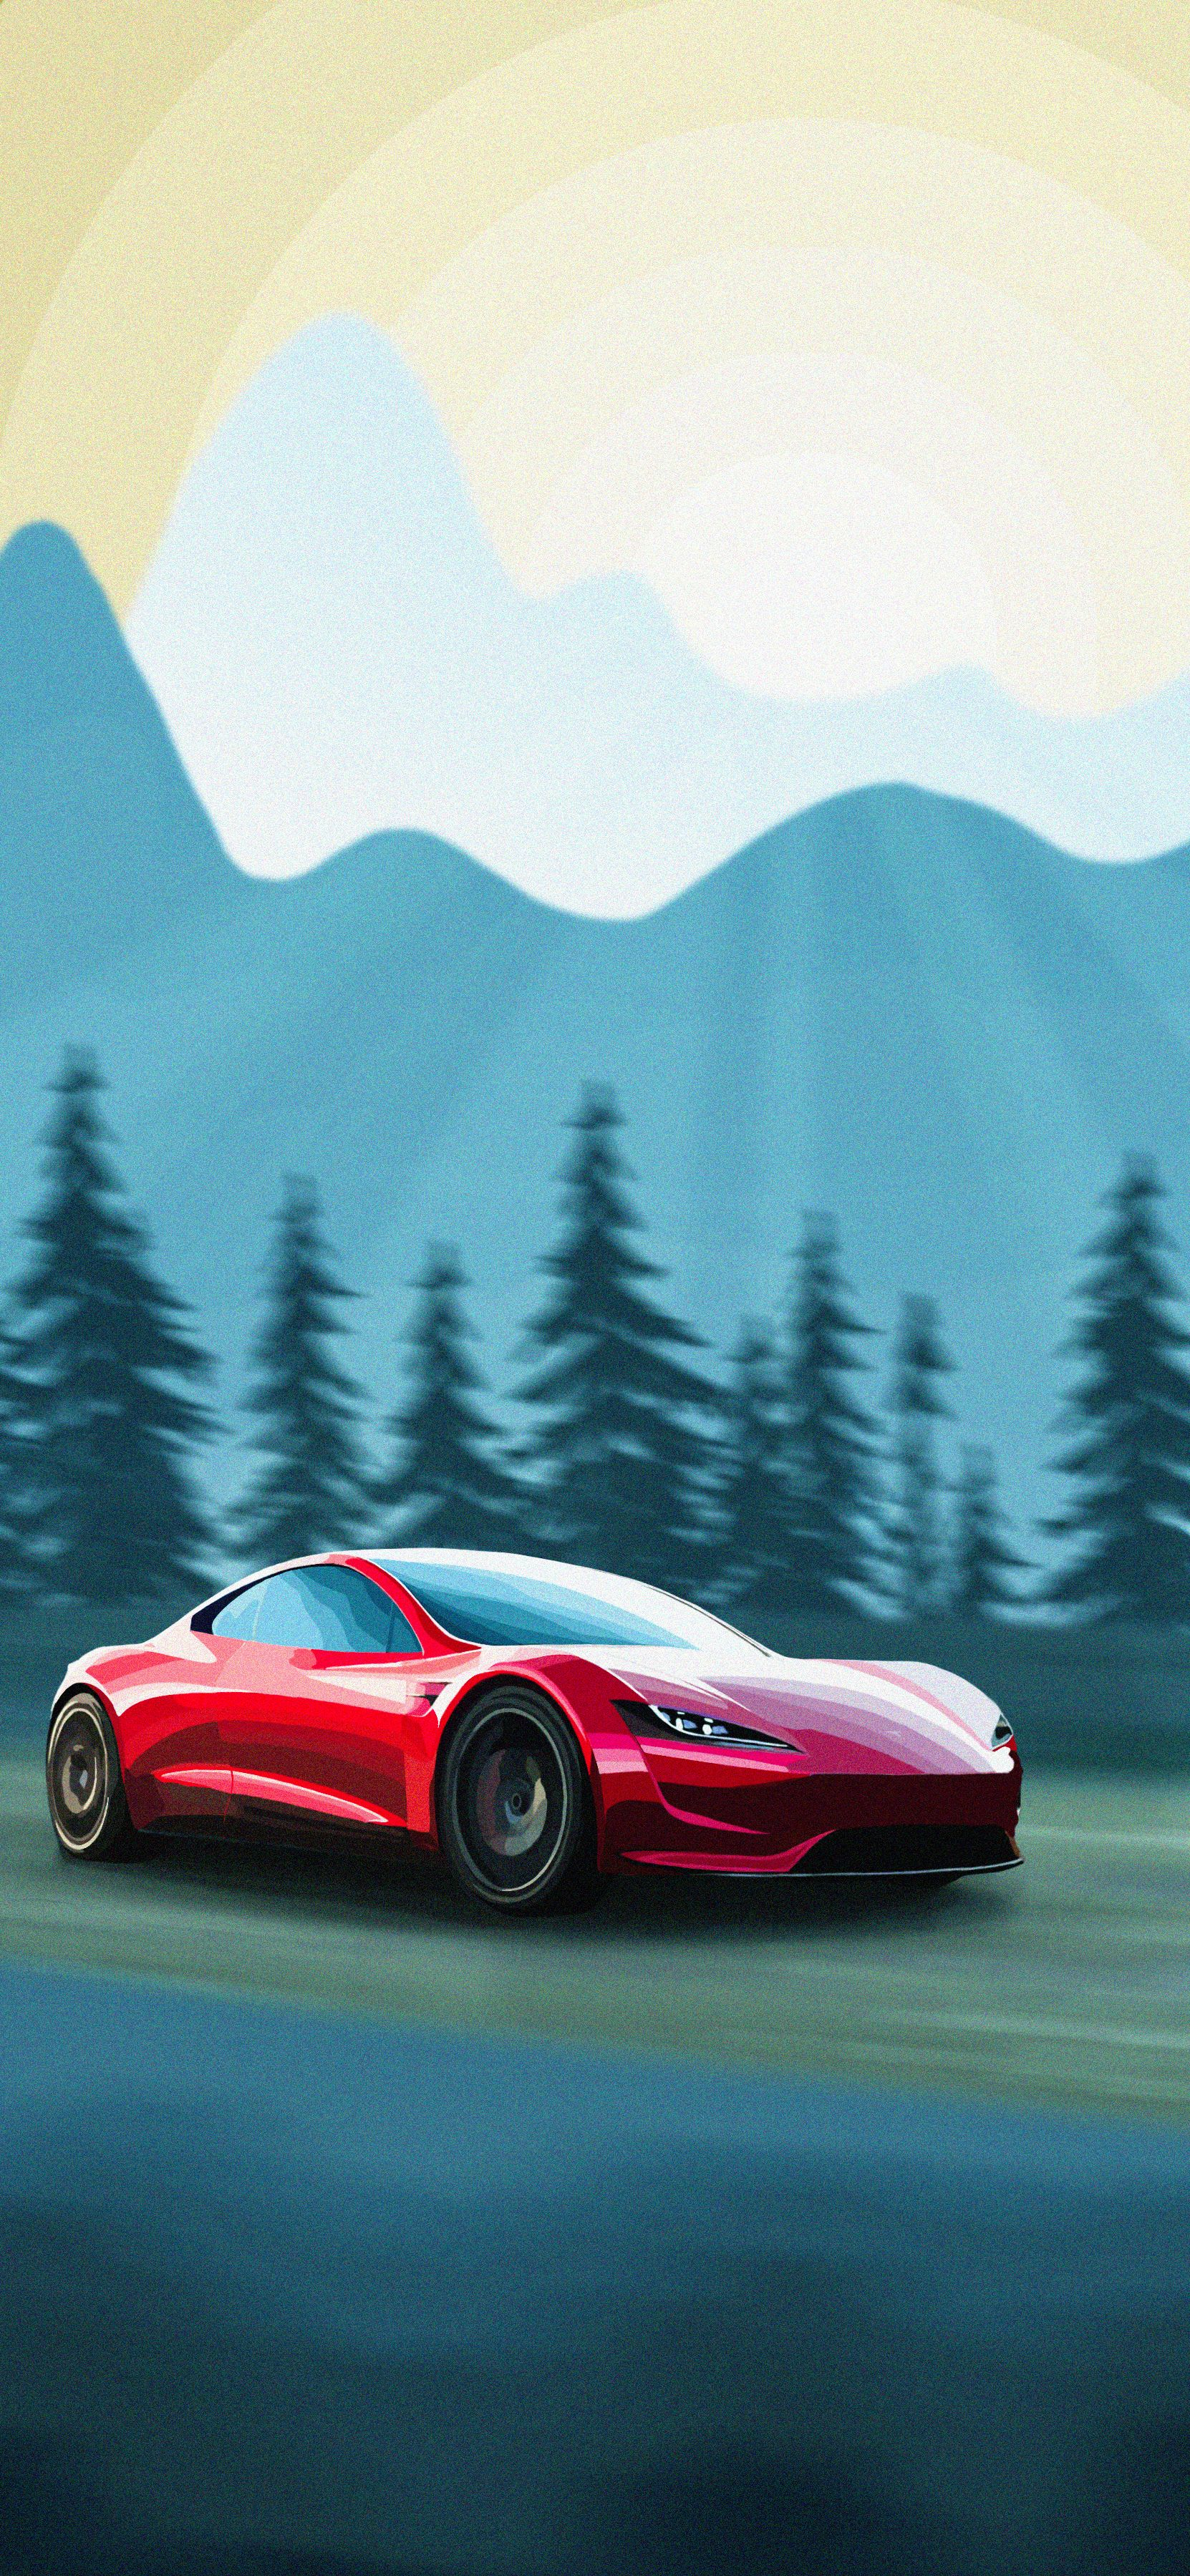 Tesla Roadster Wallpapers On Wallpaperdog